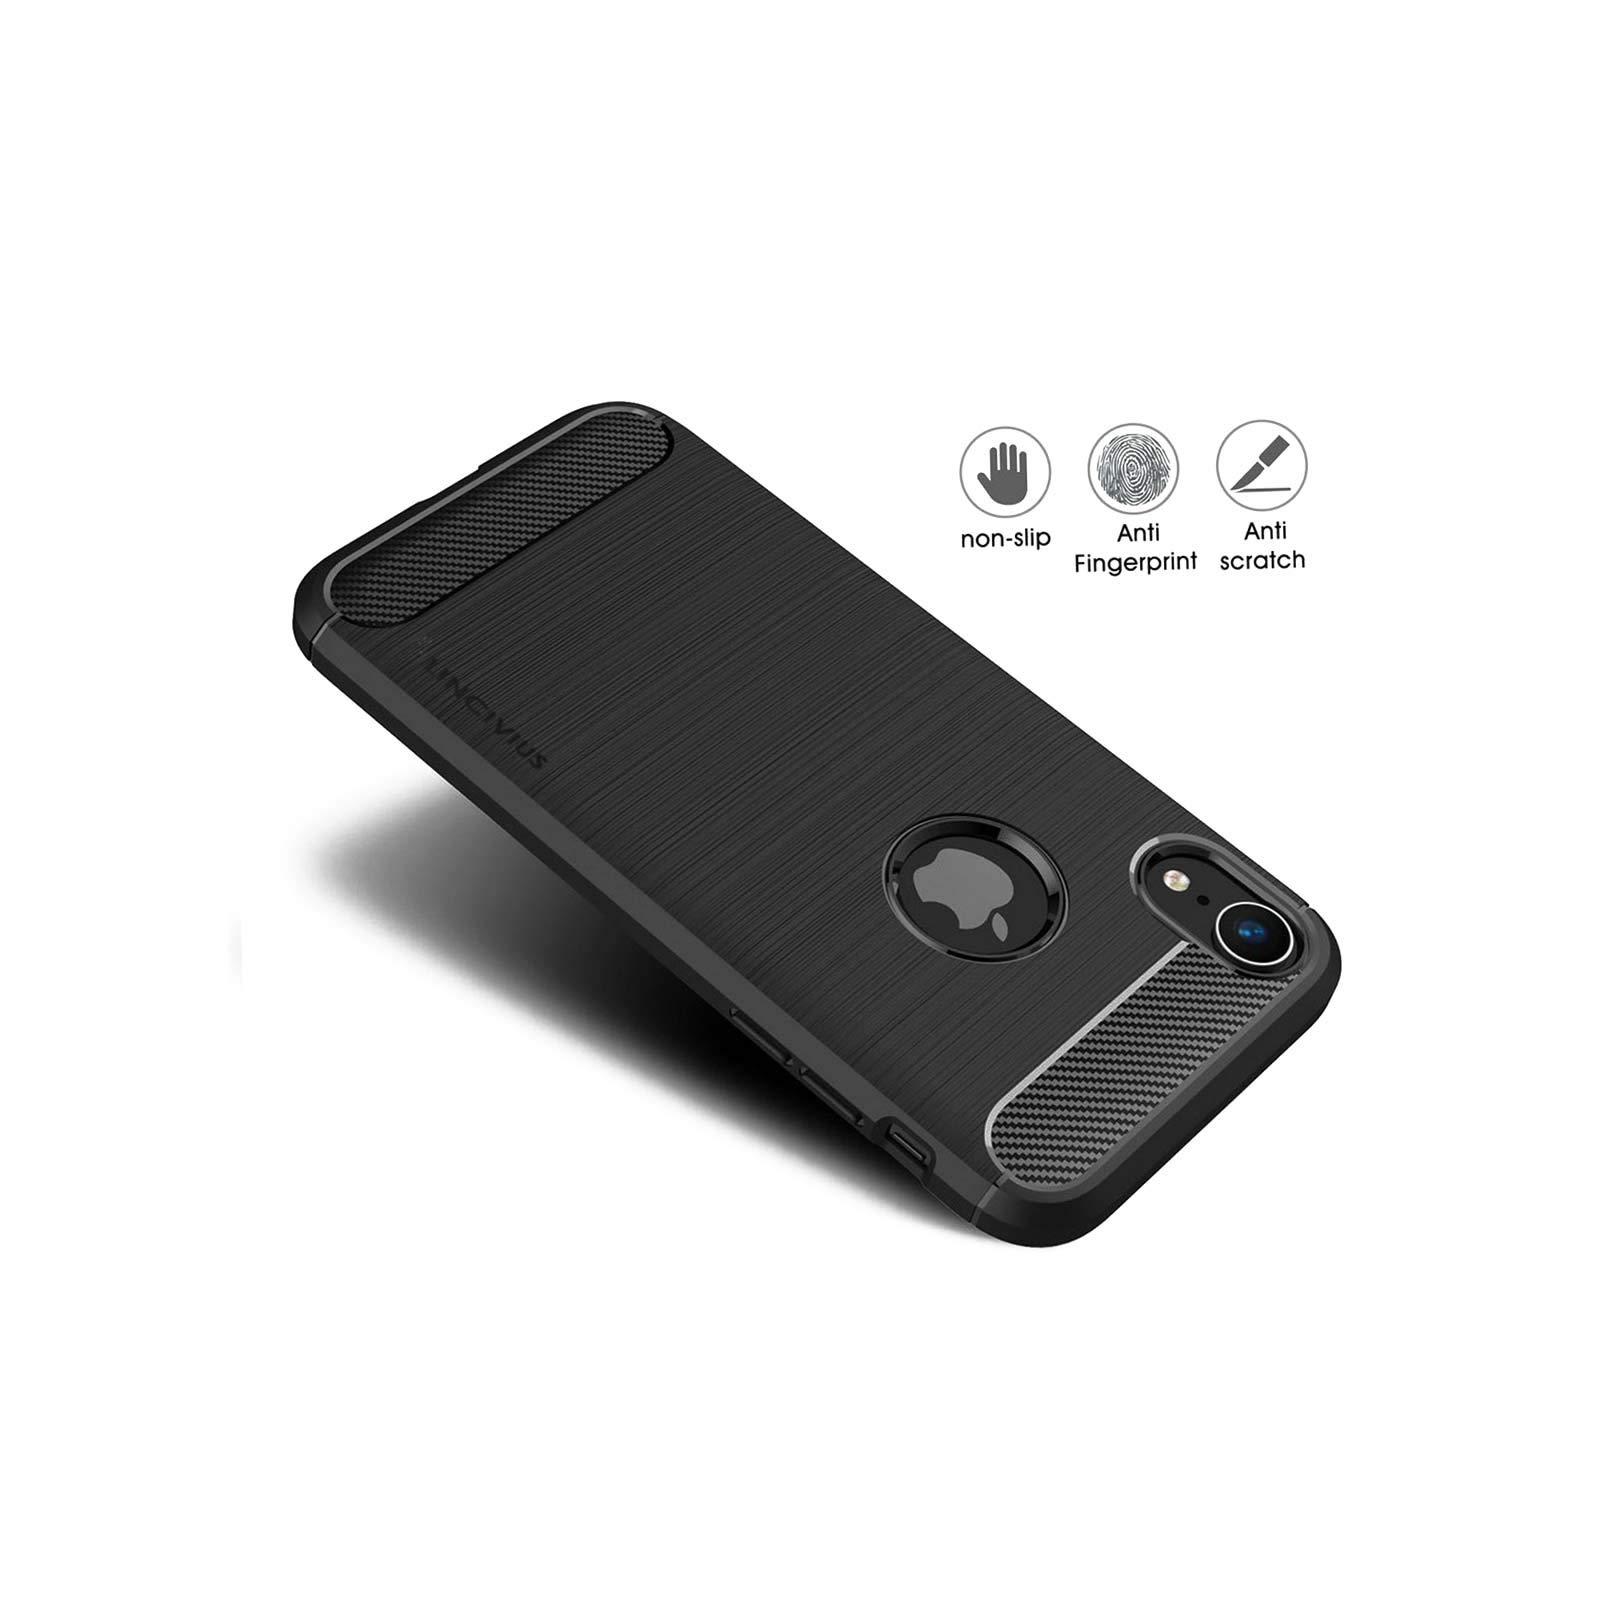 LINCIVIUS  Coque Apple iPhone XR [TPU Brushed Carbone] Protection Coque Carbon iphone XR Housse Etui Accessoires Silicone Souple Hybride Design Anti Choc